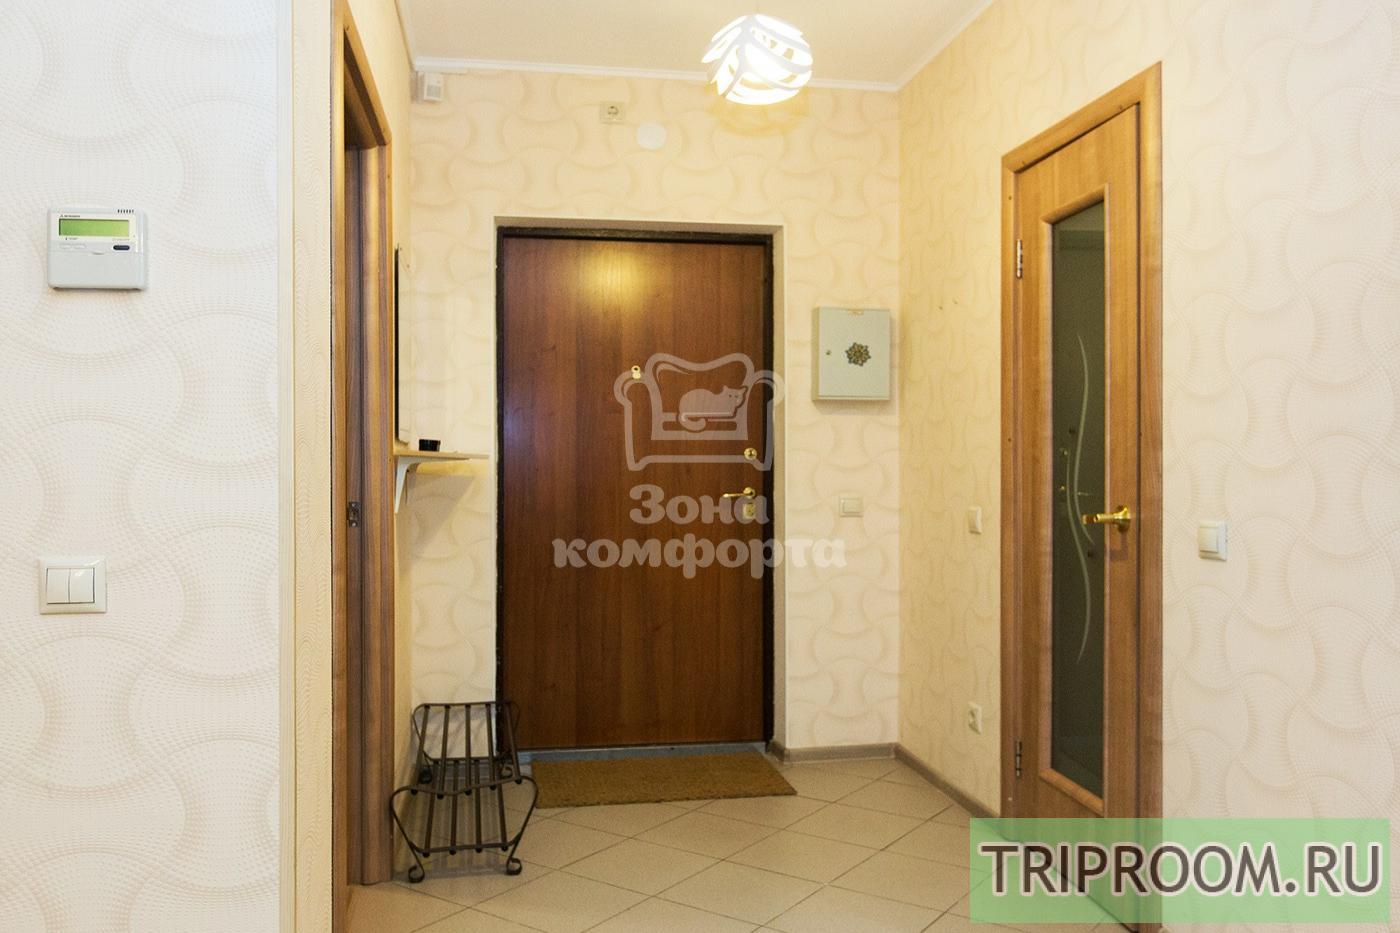 2-комнатная квартира посуточно (вариант № 34715), ул. Гагарина бульвар, фото № 22